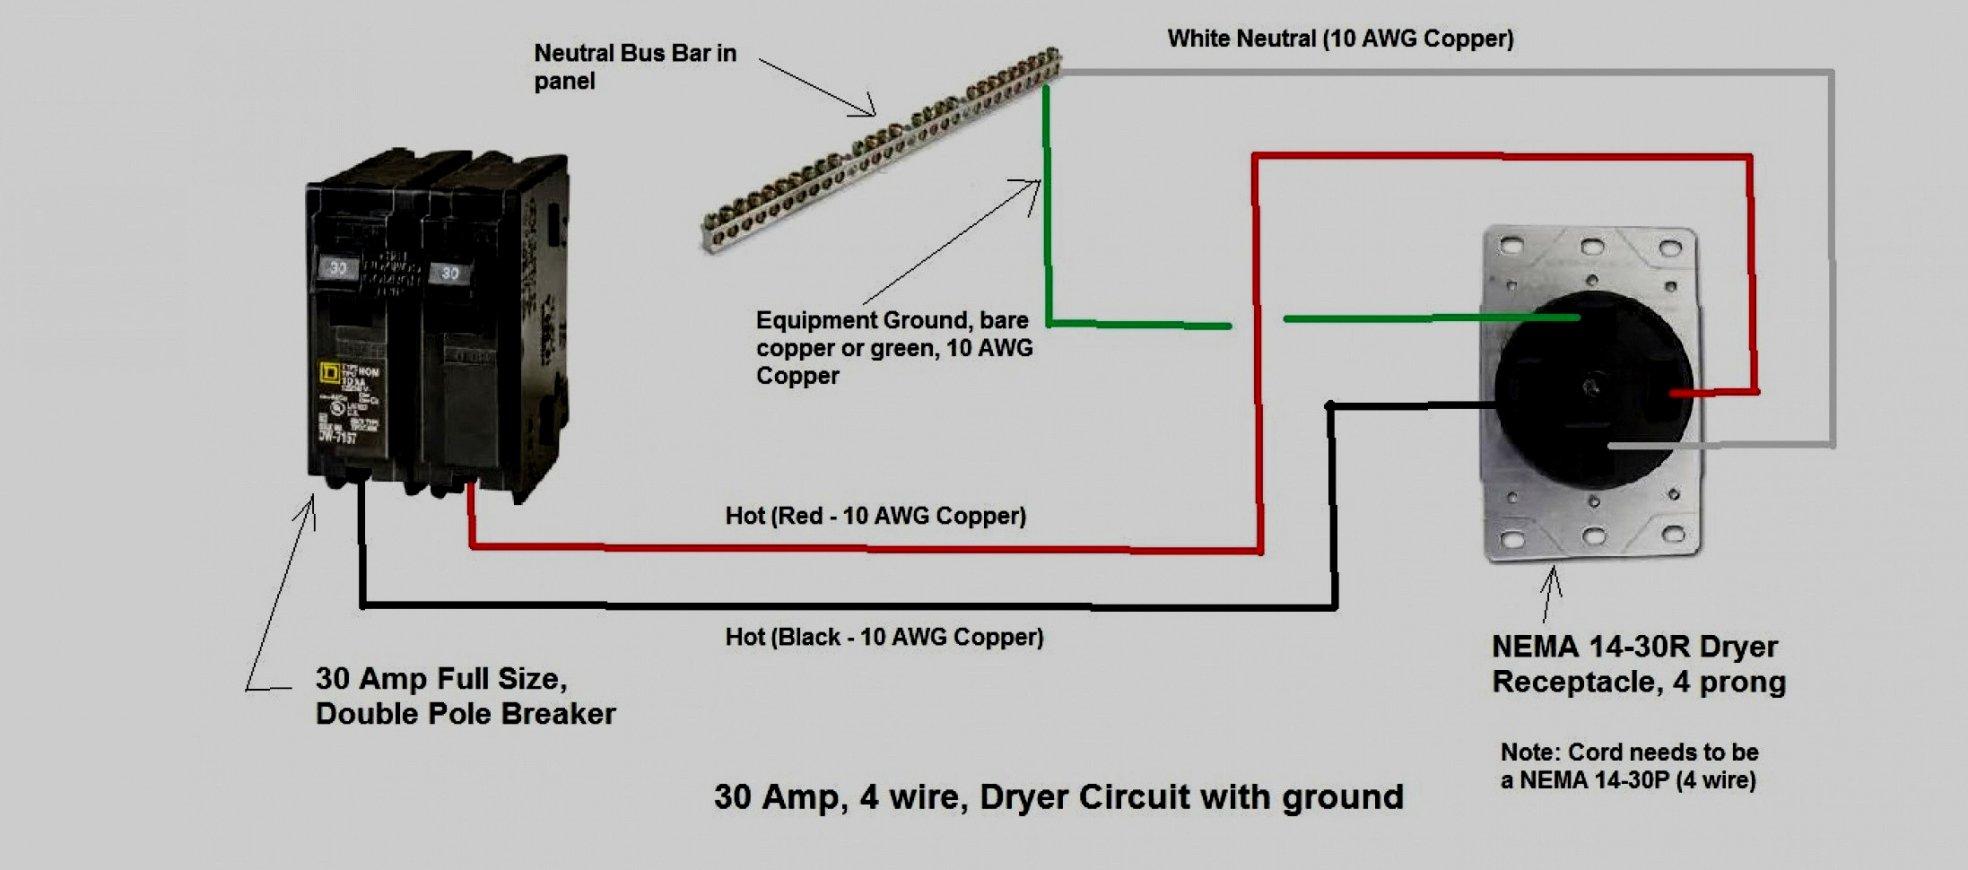 SV_5332] Outlet Wiring Diagram Furthermore 4 Wire Dryer Plug Diagram Wiring  Schematic WiringPead Kargi Lexor Sand Ophag Greas Benkeme Mohammedshrine Librar Wiring 101